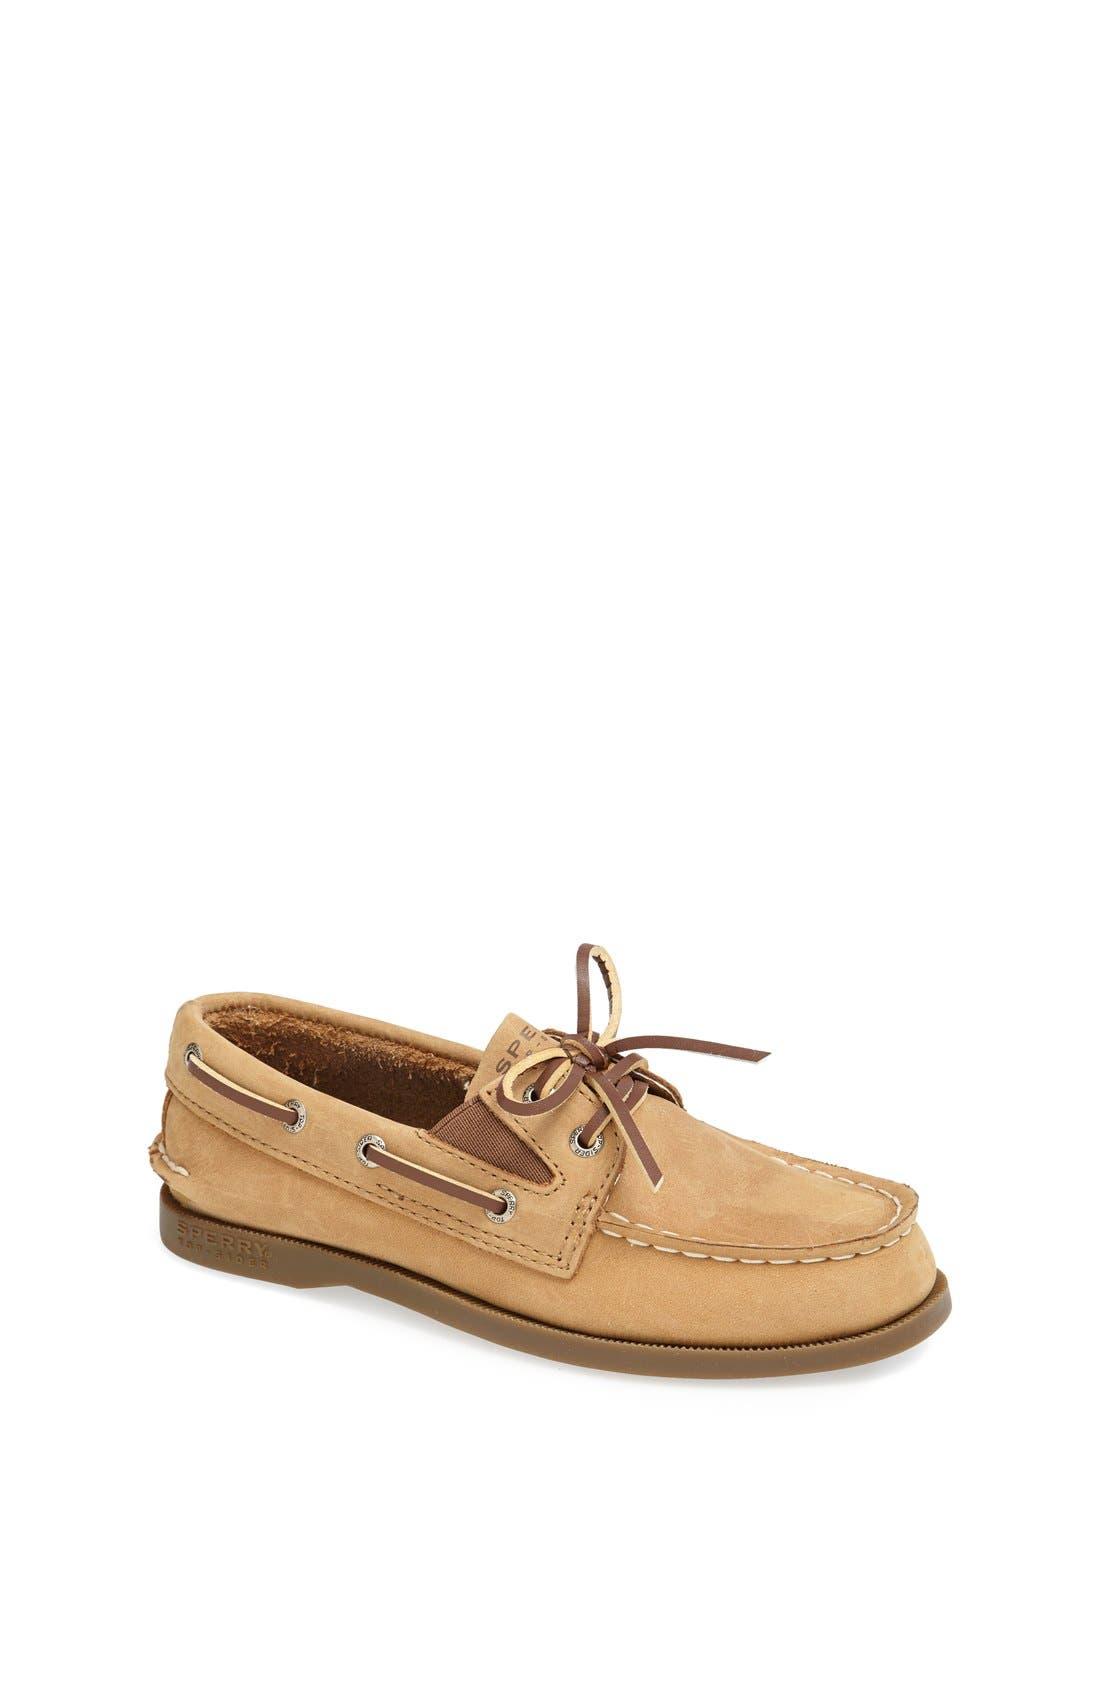 Boys Sperry Kids Authentic Original Boat Shoe